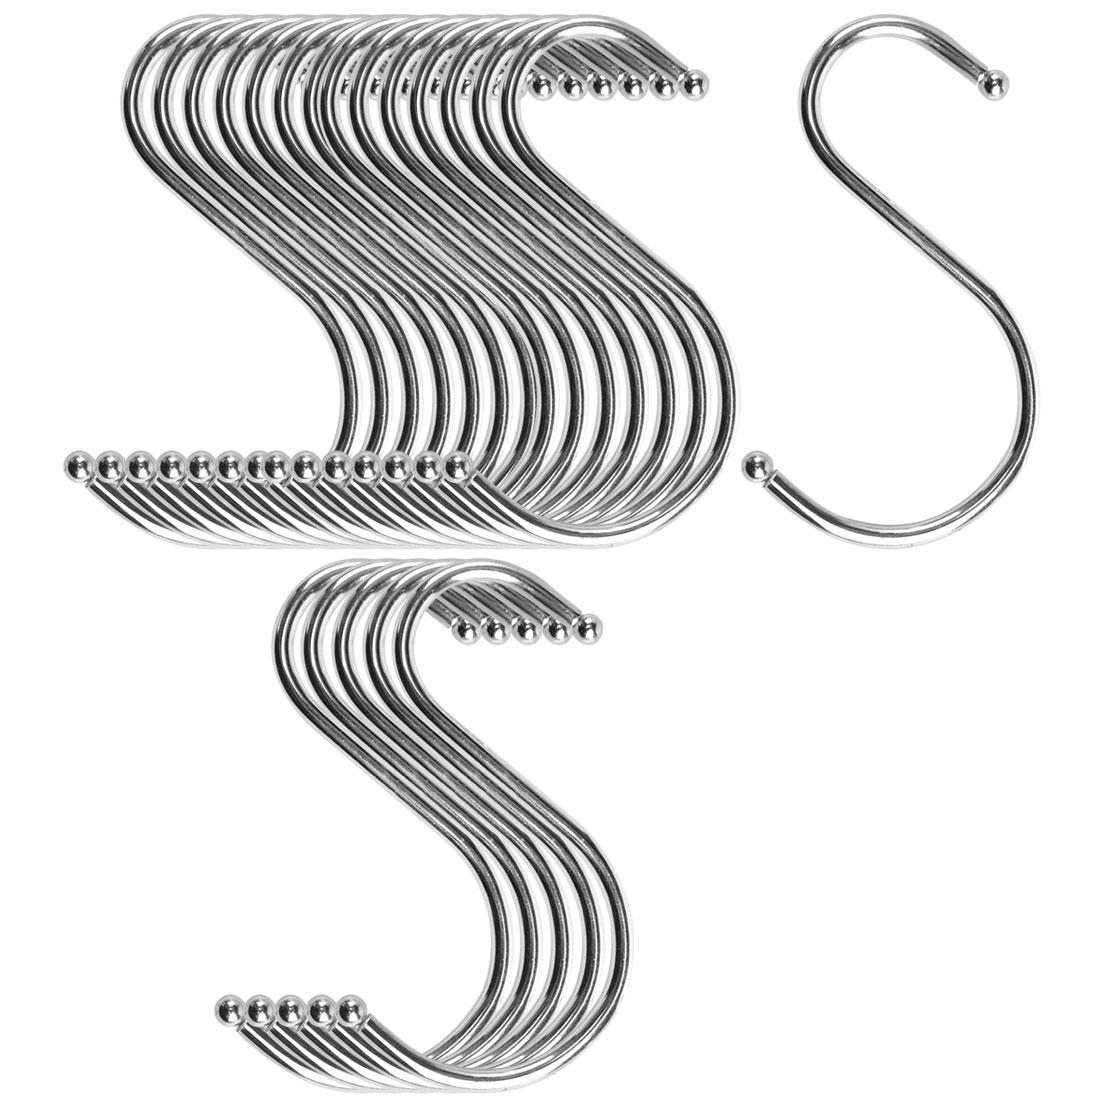 S Shape Hook Rack Stainless Steel for Kitchenware Coat Towel Holder 20 Pack